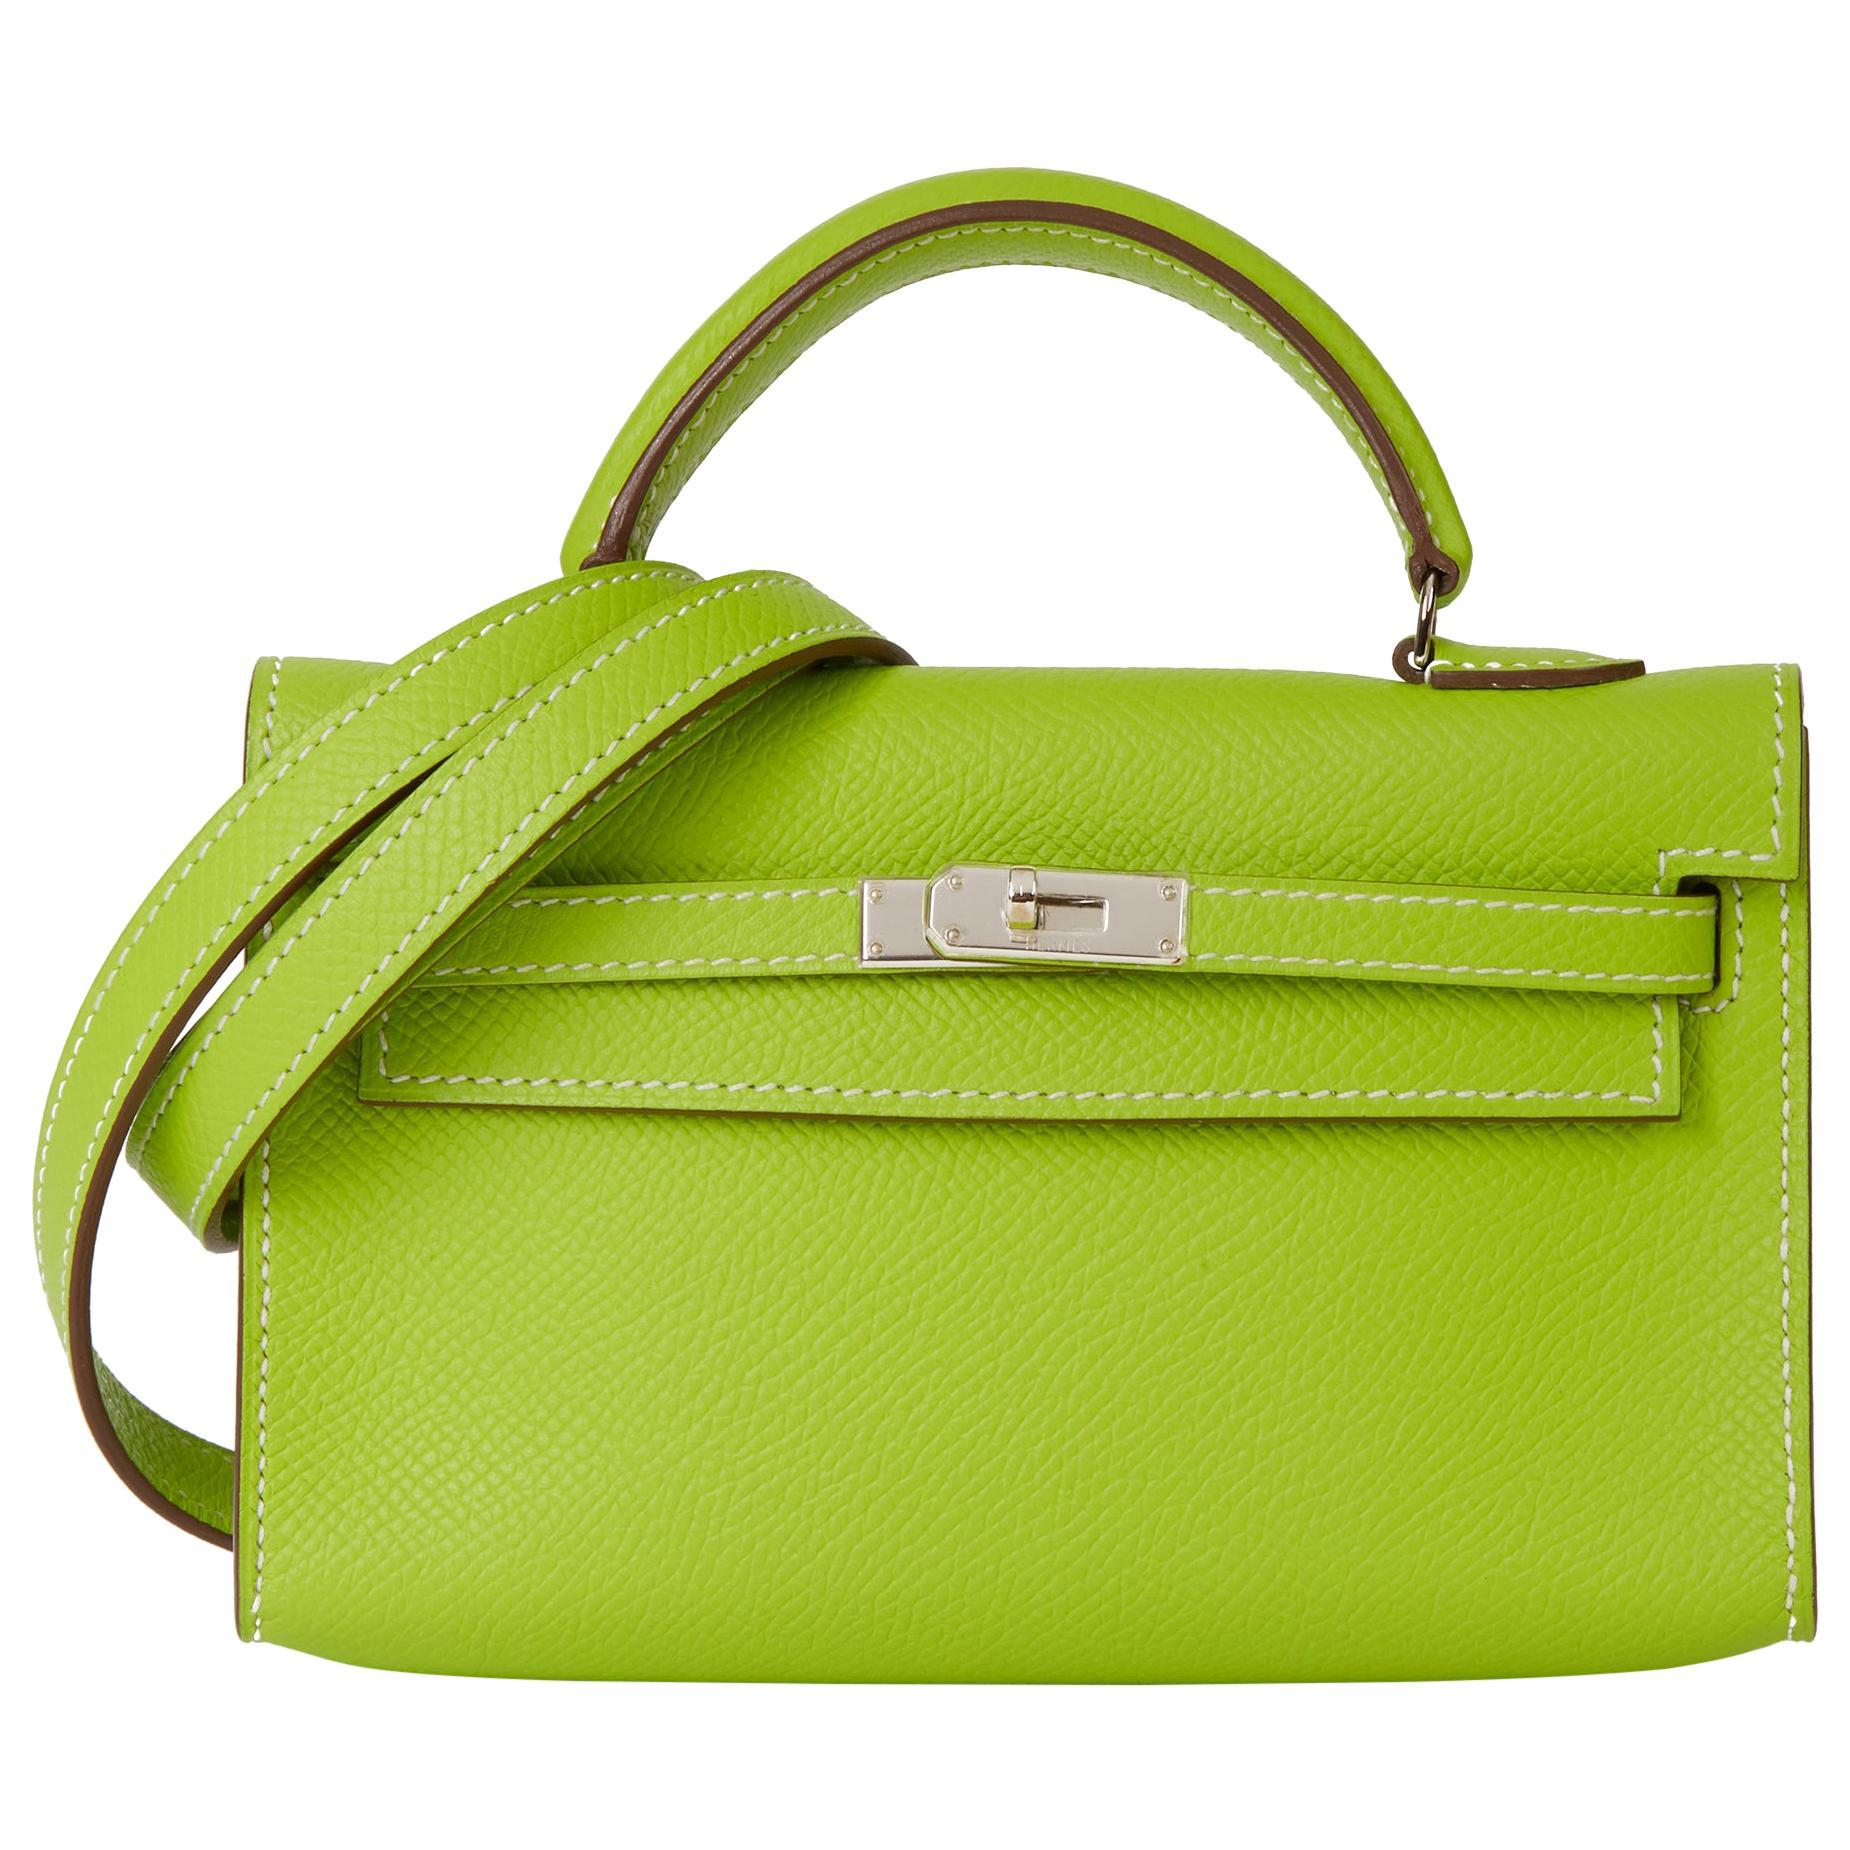 2011 Hermès Kiwi Epsom Leather Candy Collection Kelly Tiny